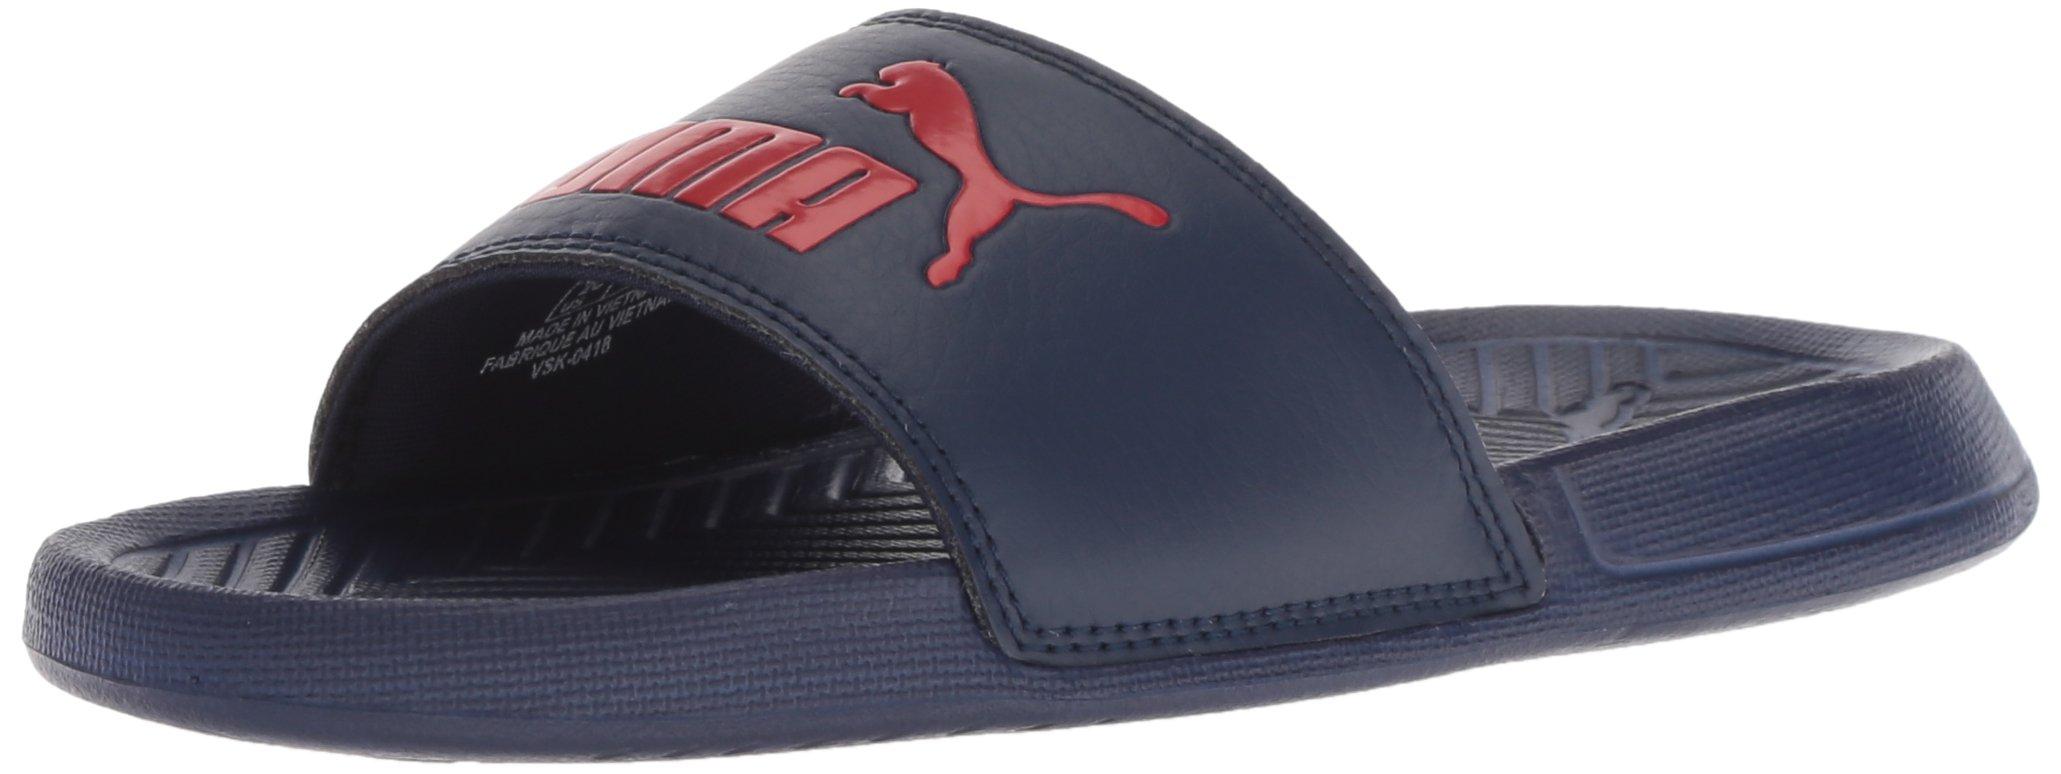 PUMA Unisex Popcat Slide Sandal, Peacoat-Ribbon red, 5 M US Big Kid